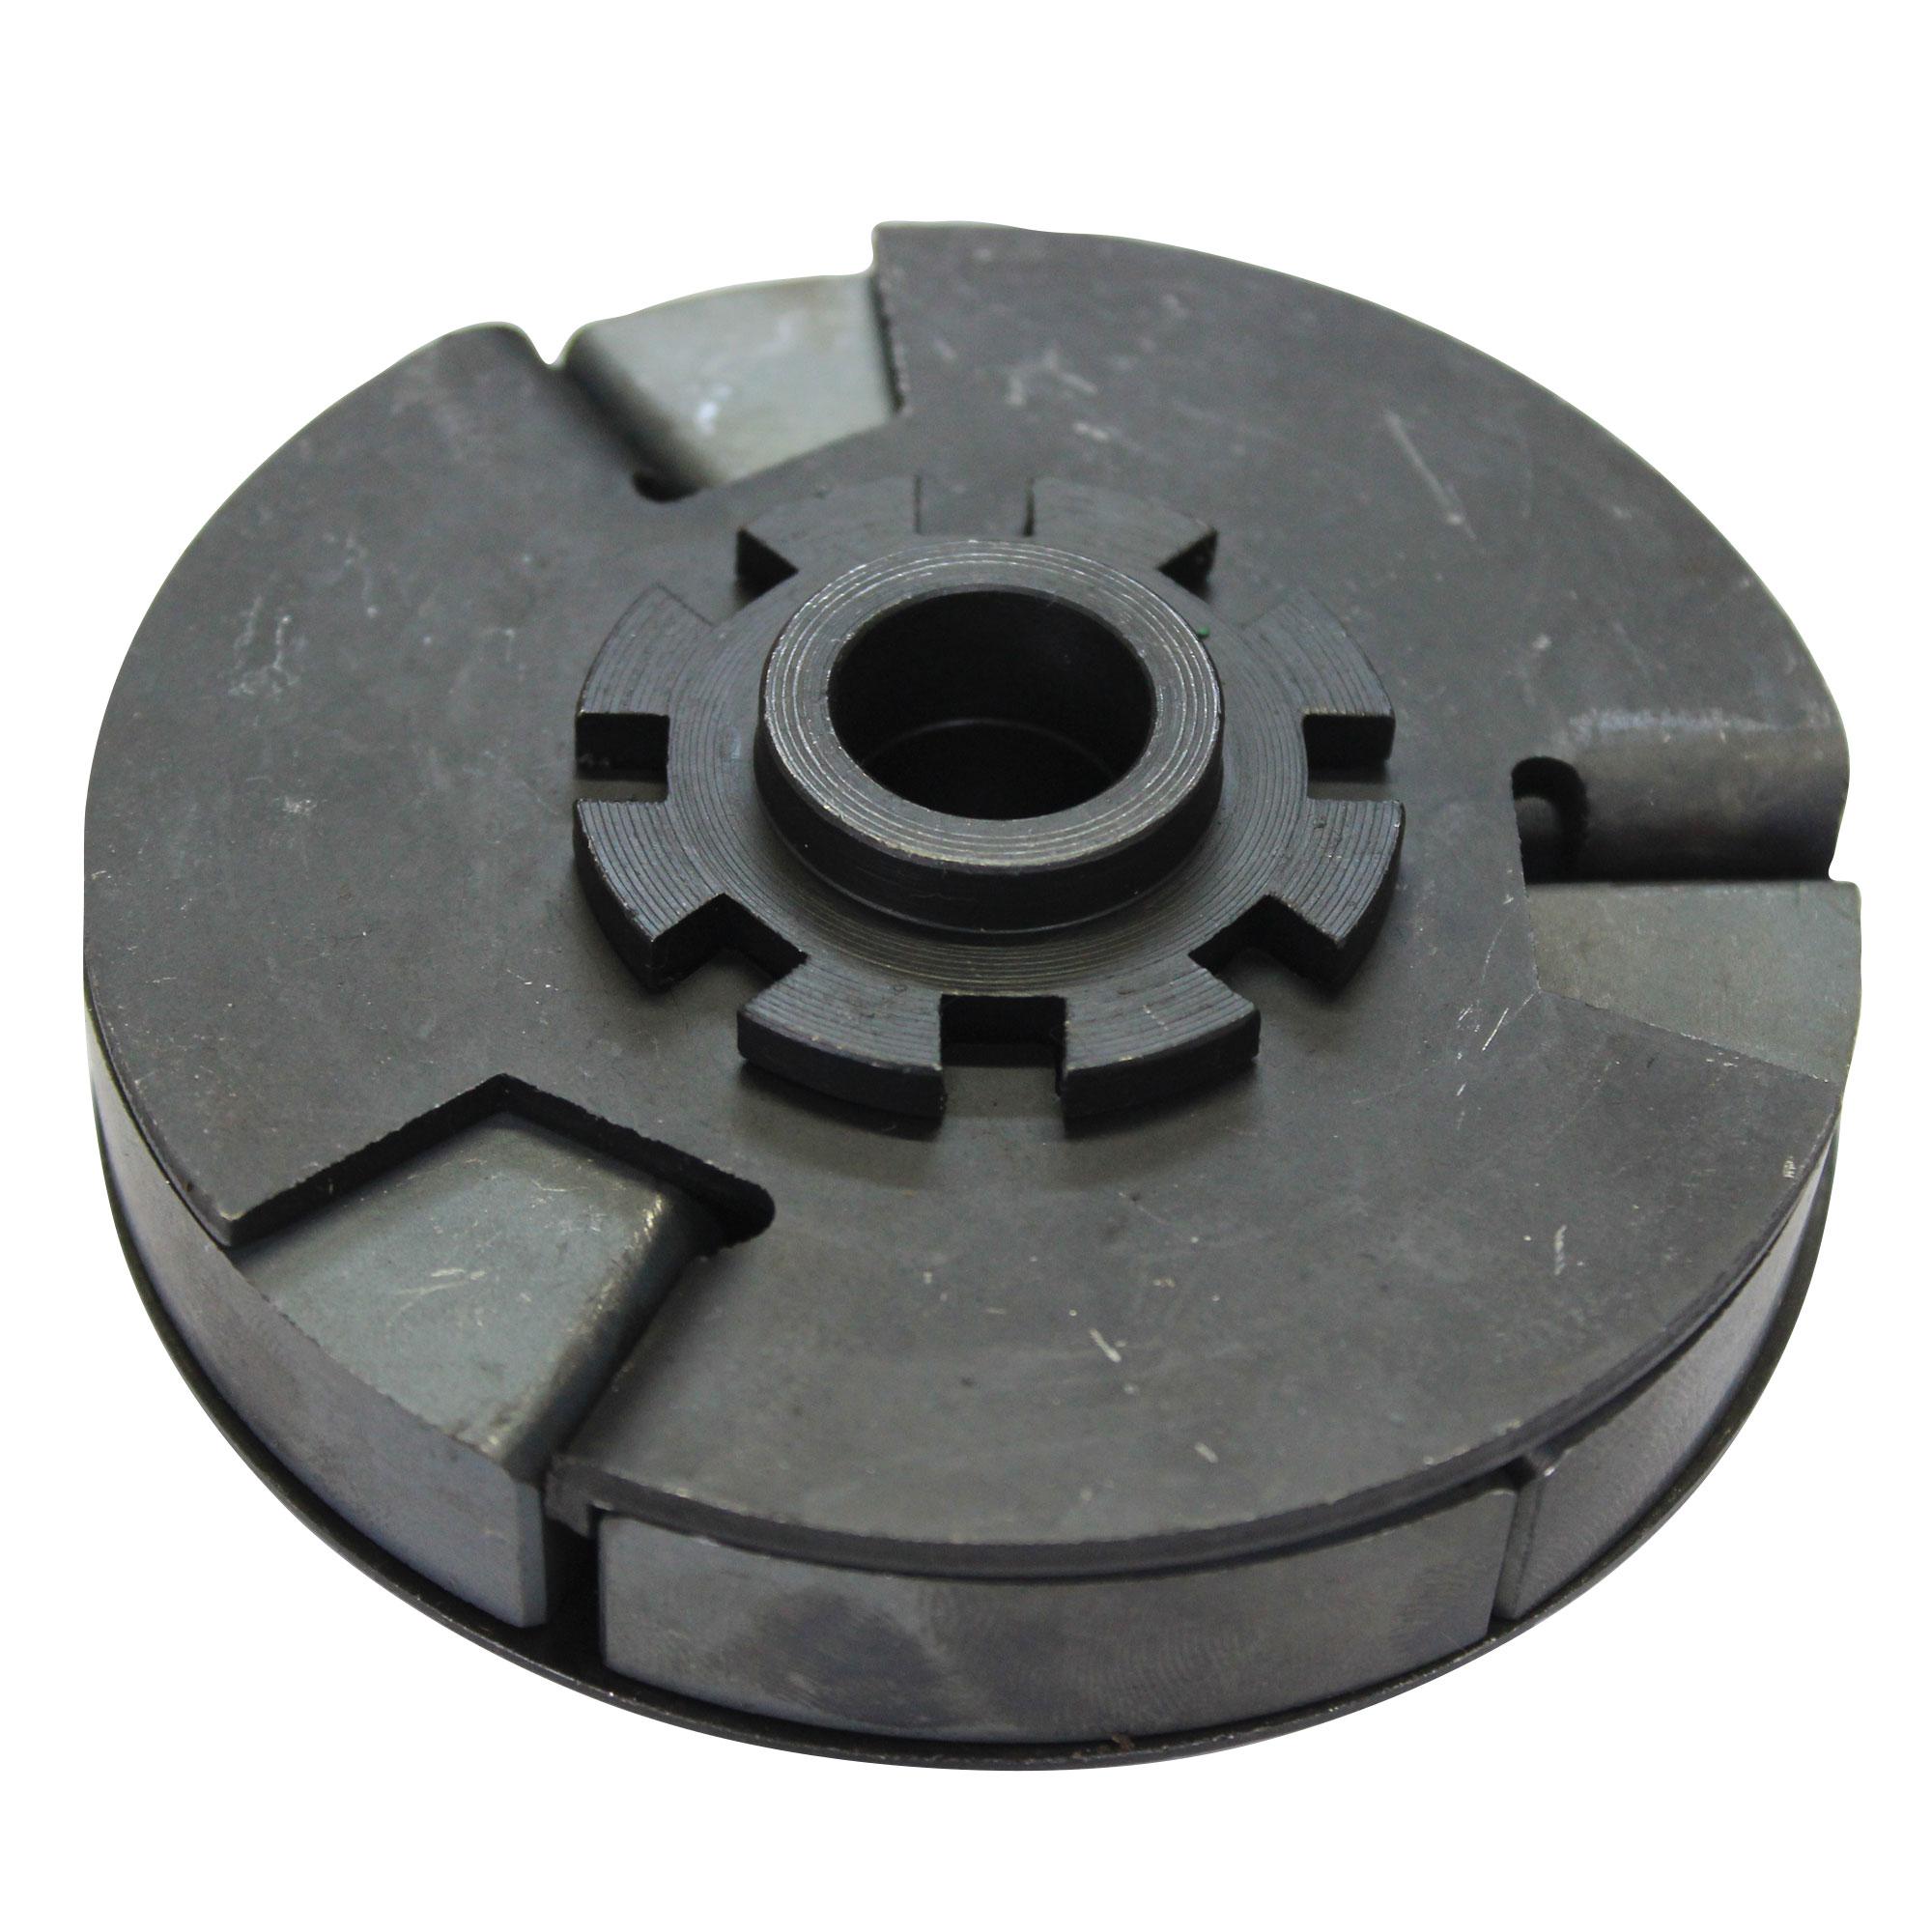 Embreagem Centrífuga - Polia / Corrente P/ Motor Gaso. 1